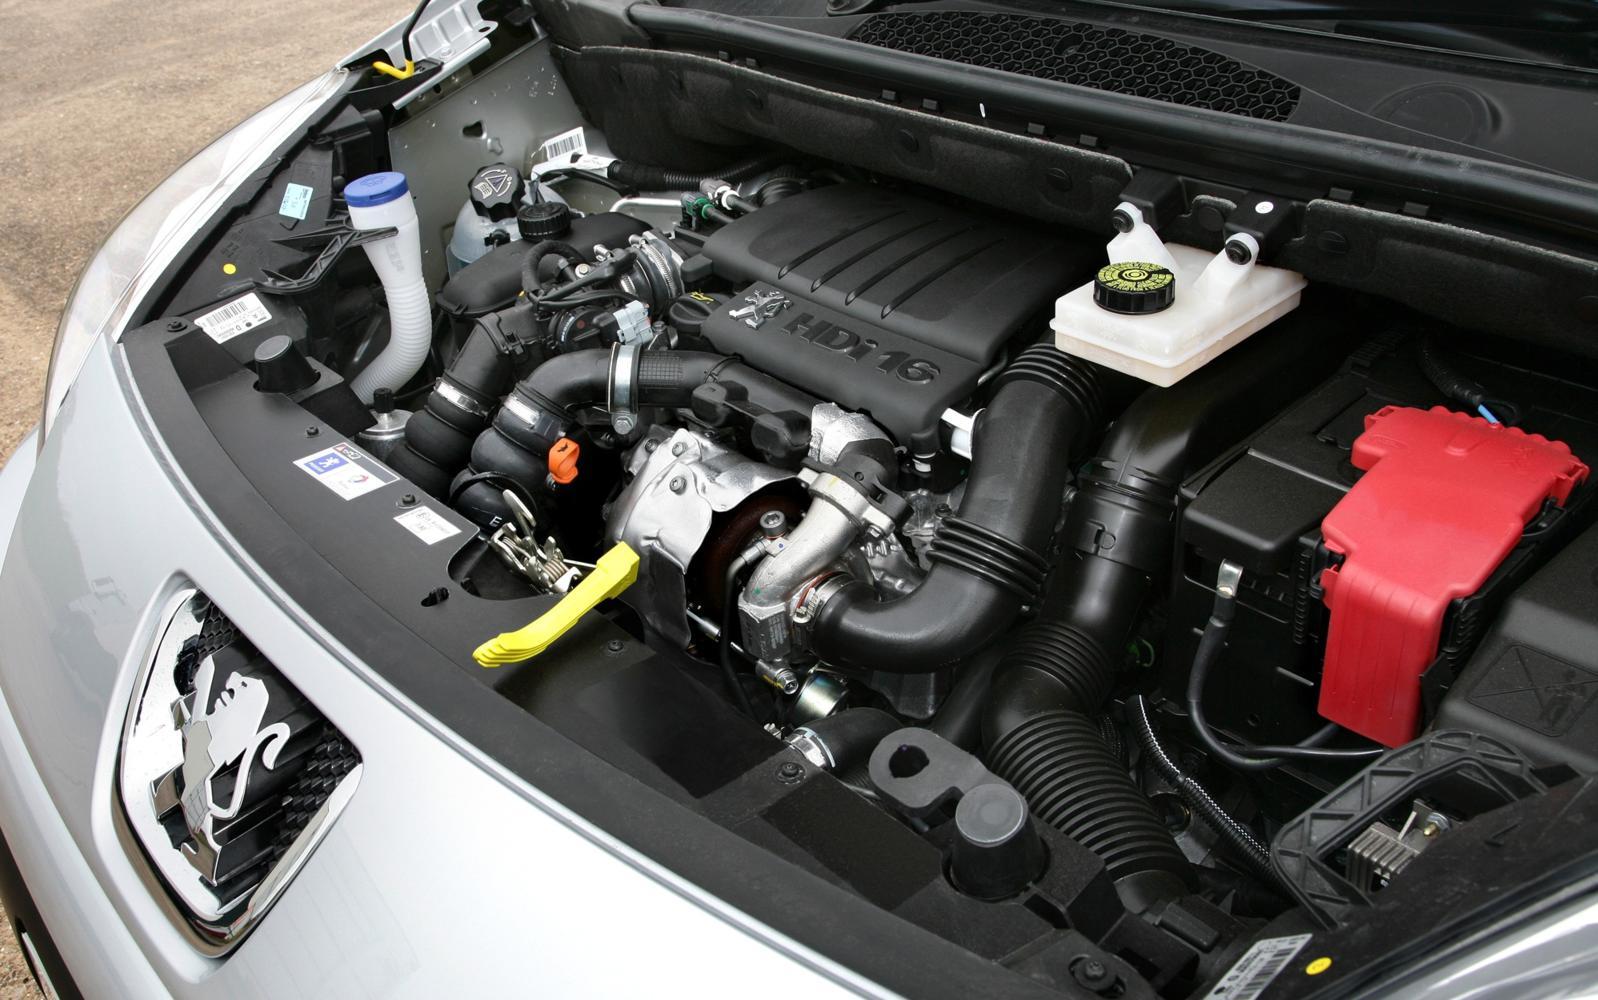 Peugeot Partner Tepee 2013 Engine Bay Front Seat Driver